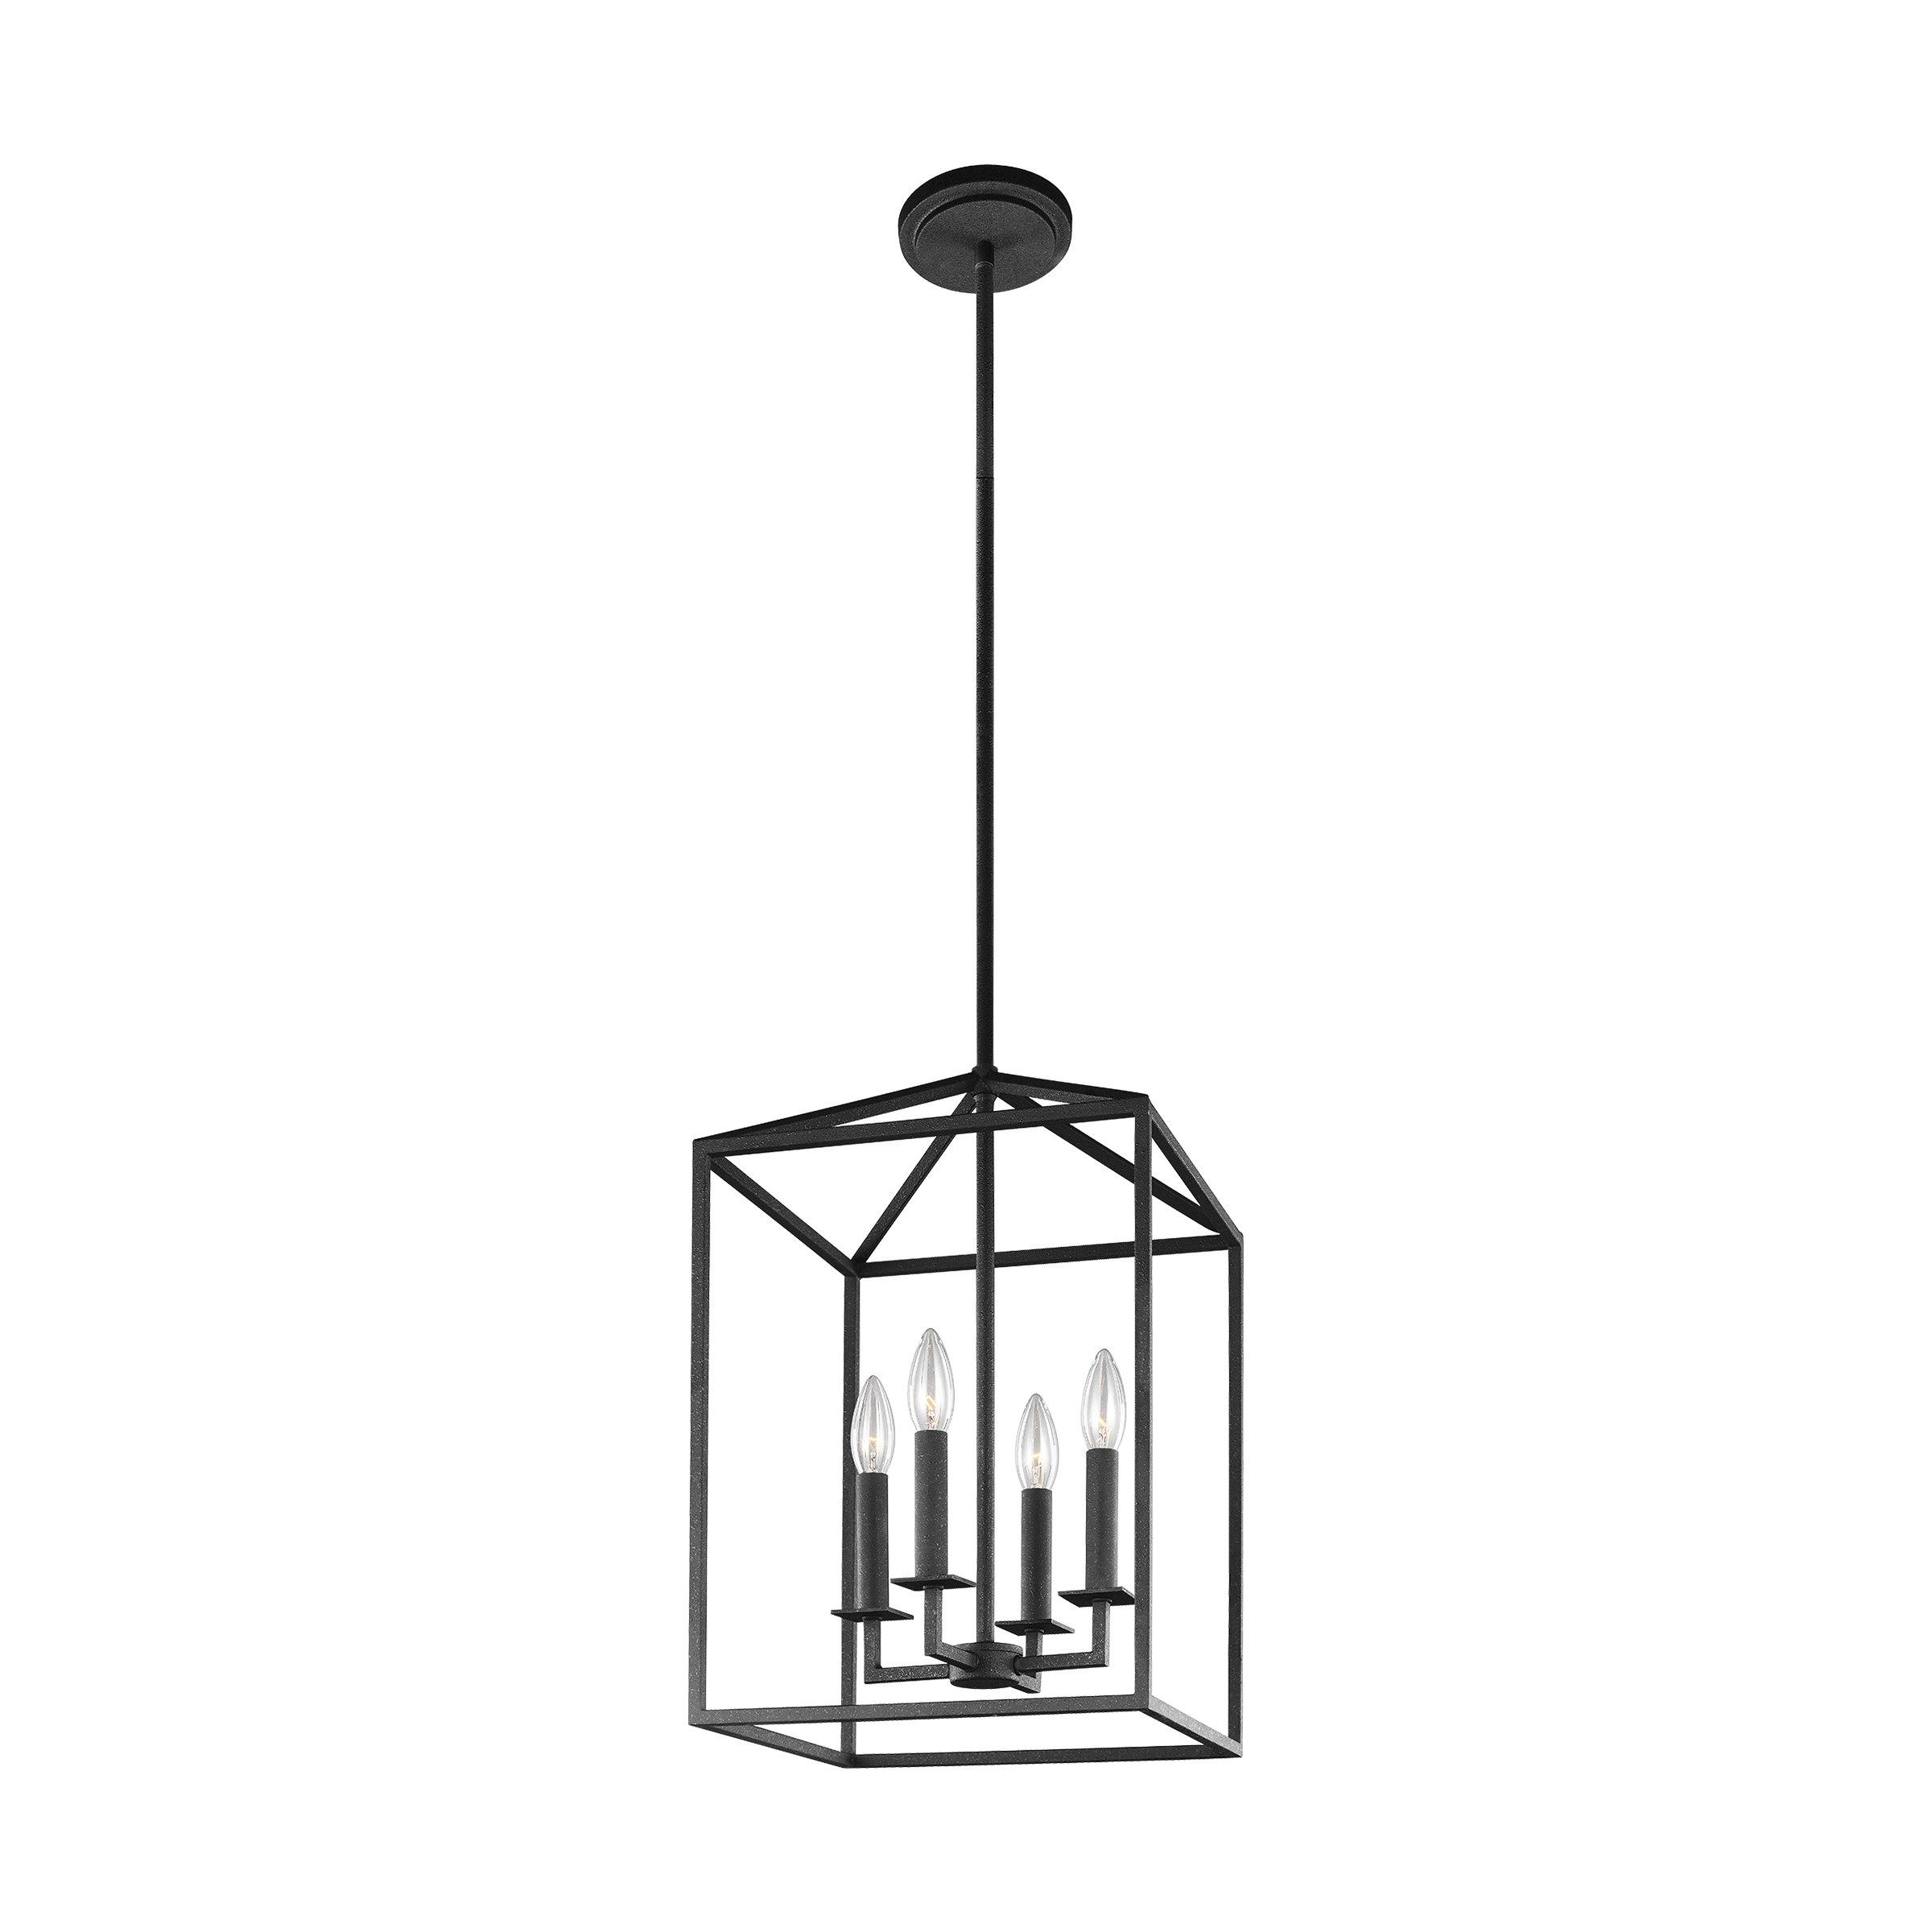 Odie 4 Light Lantern Square / Rectangle Pendant Throughout Well Known 4 Light Lantern Square / Rectangle Pendants (Gallery 12 of 20)